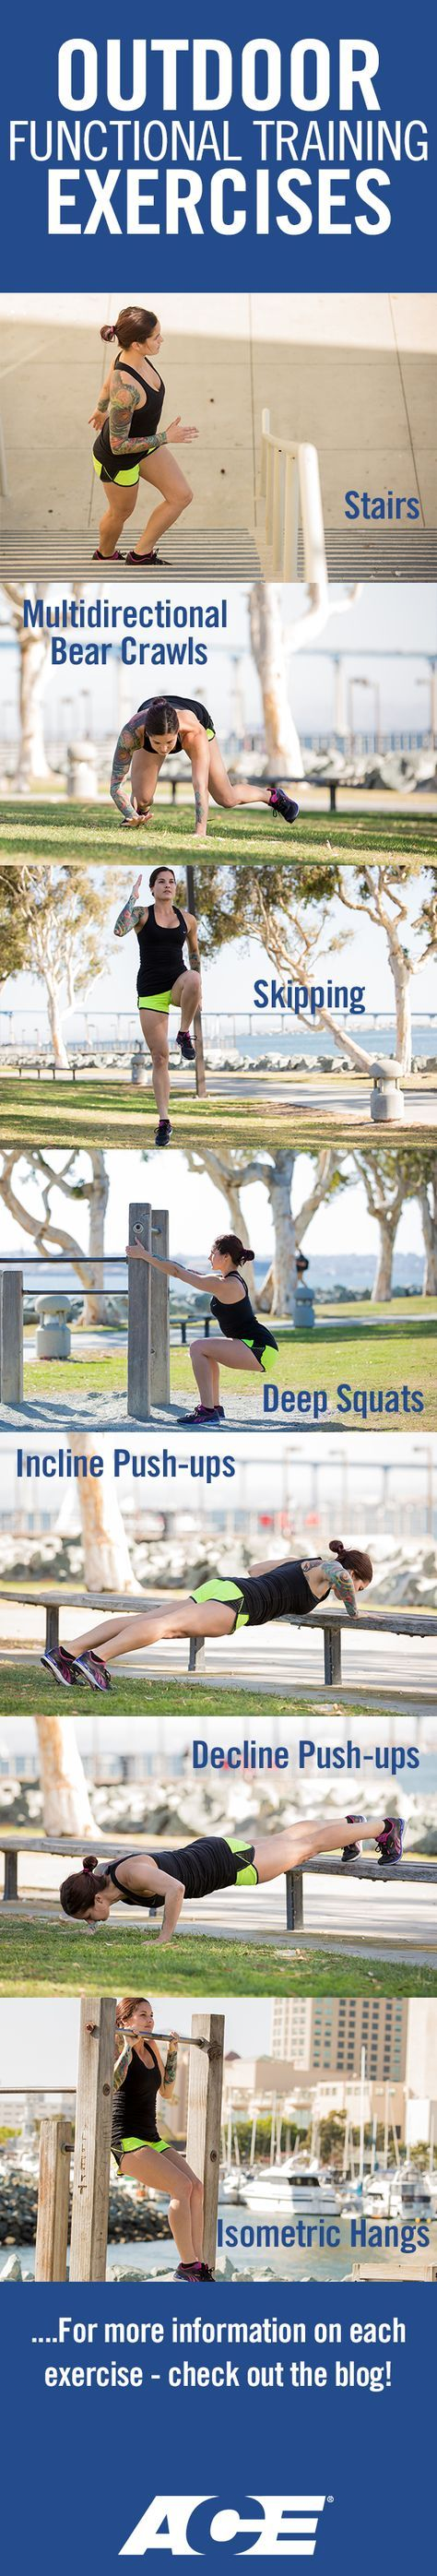 Outdoor Functional Training Exercises http://www.rimsportsgear.com/